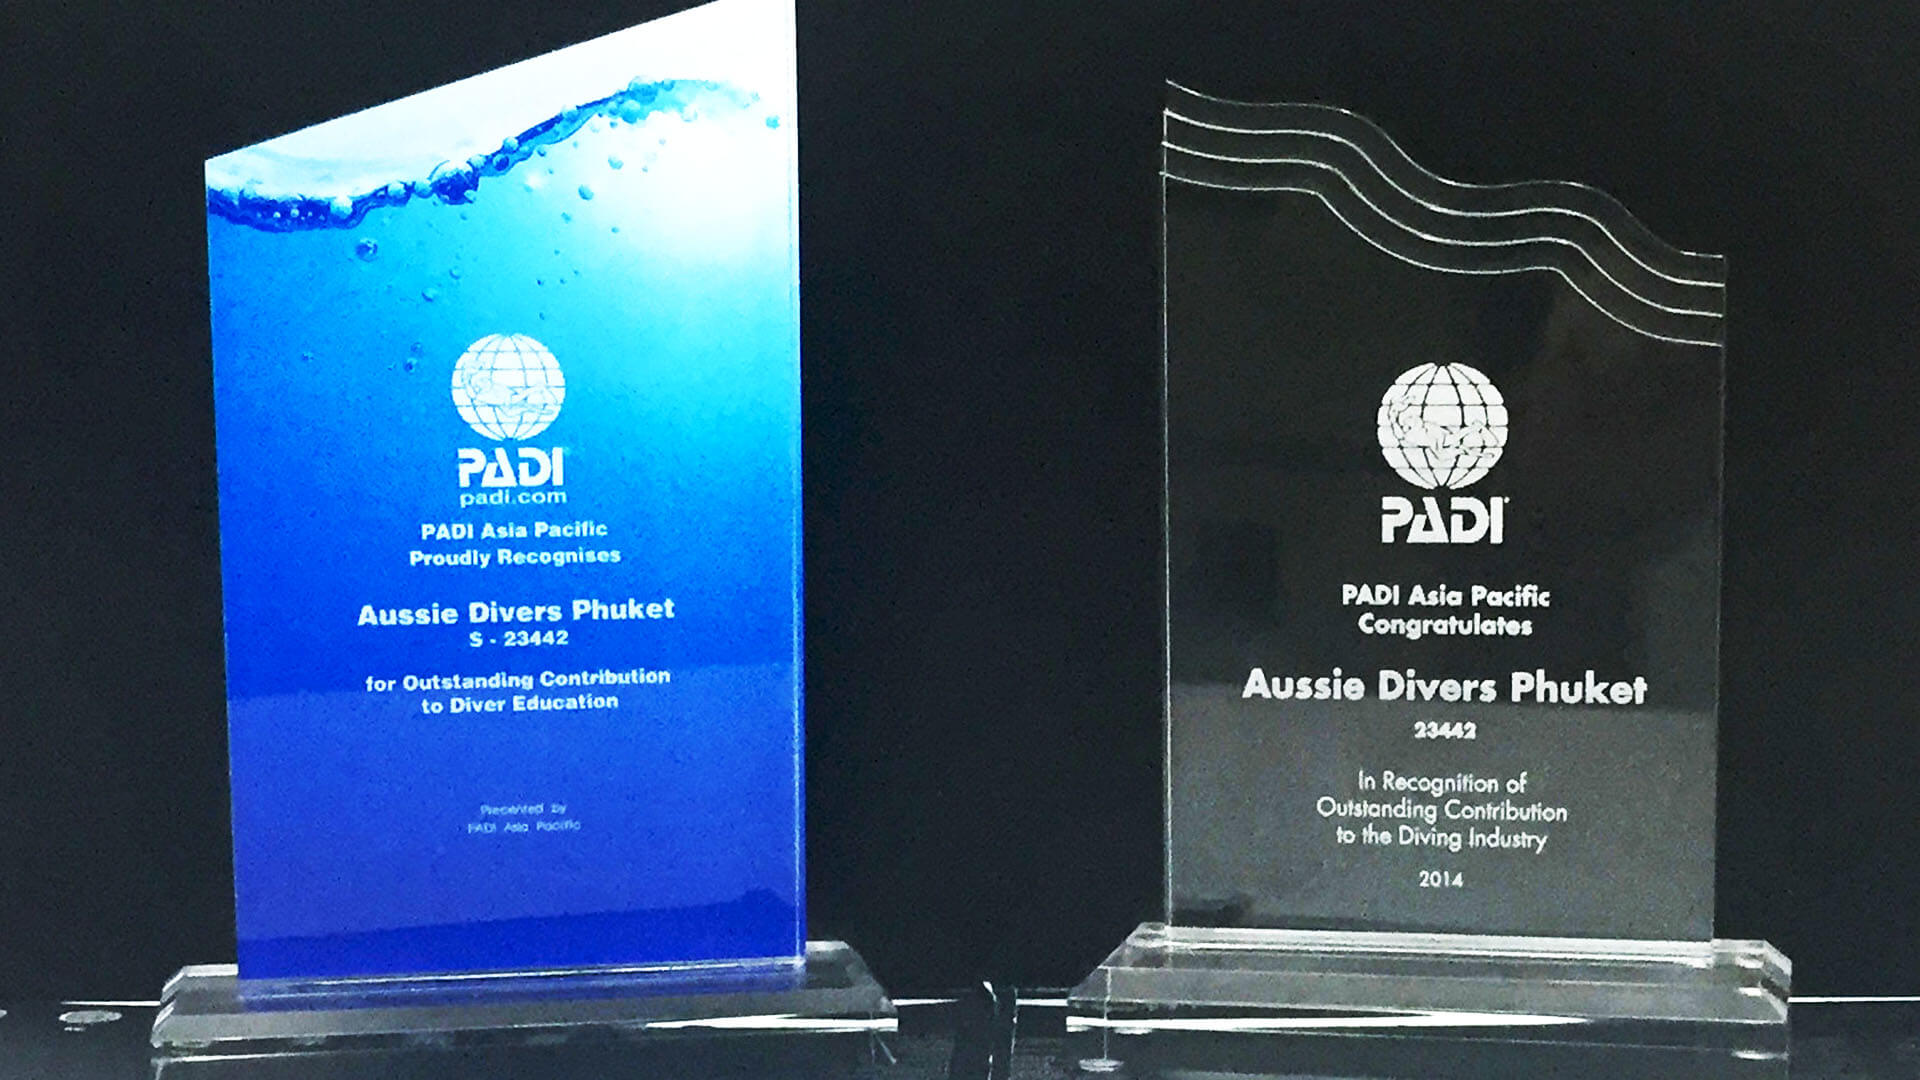 Aussie Divers Phuket Wins Awards